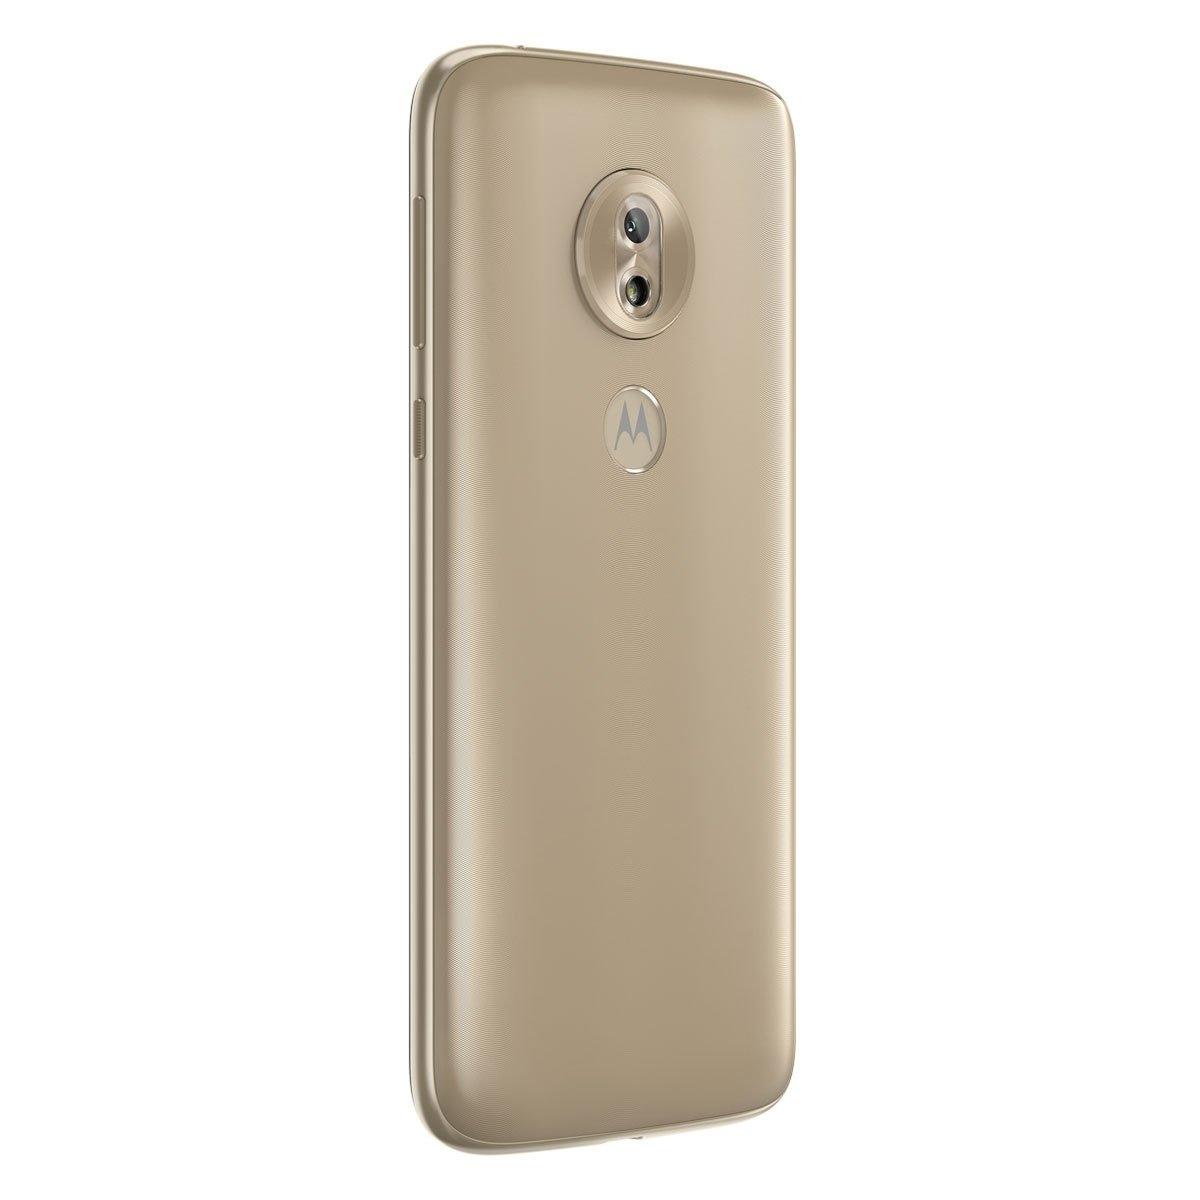 Celular Motorola G7 Play Xt1952 Color Dorado R9 (Telcel)